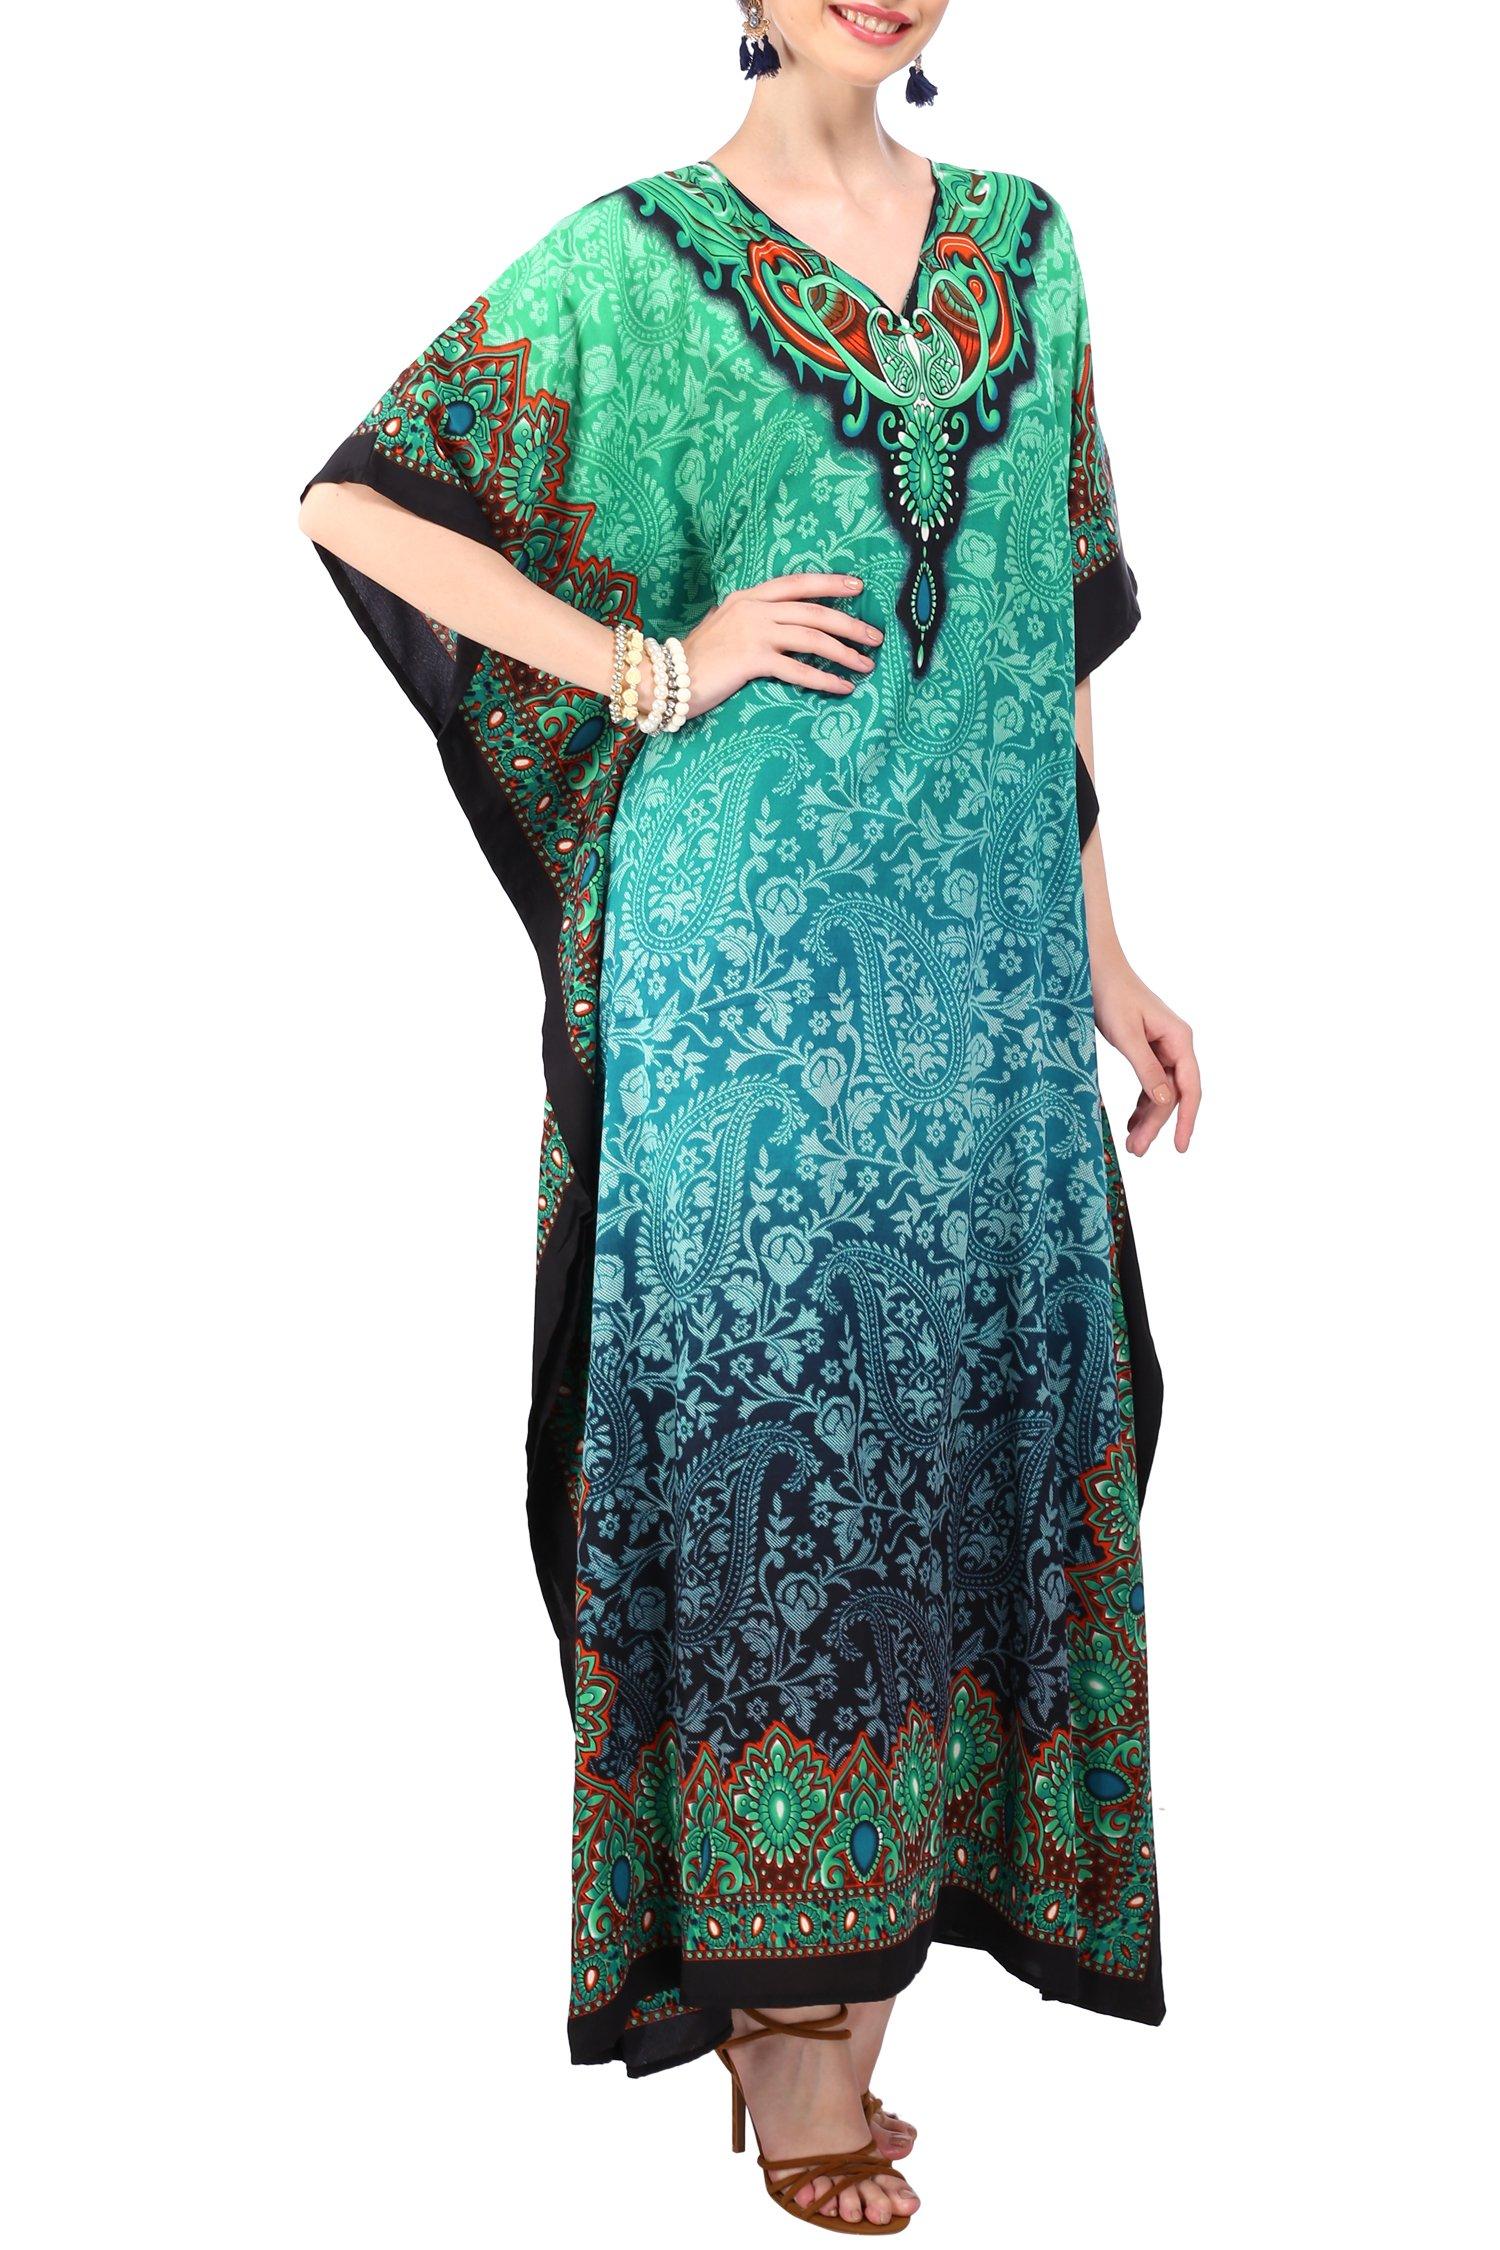 Miss Lavish London Women Kaftan Tunic Kimono Free Size Long Maxi Party Dress Loungewear Holidays Nightwear Beach Everyday Cover up Dresses by Miss Lavish London (Image #2)